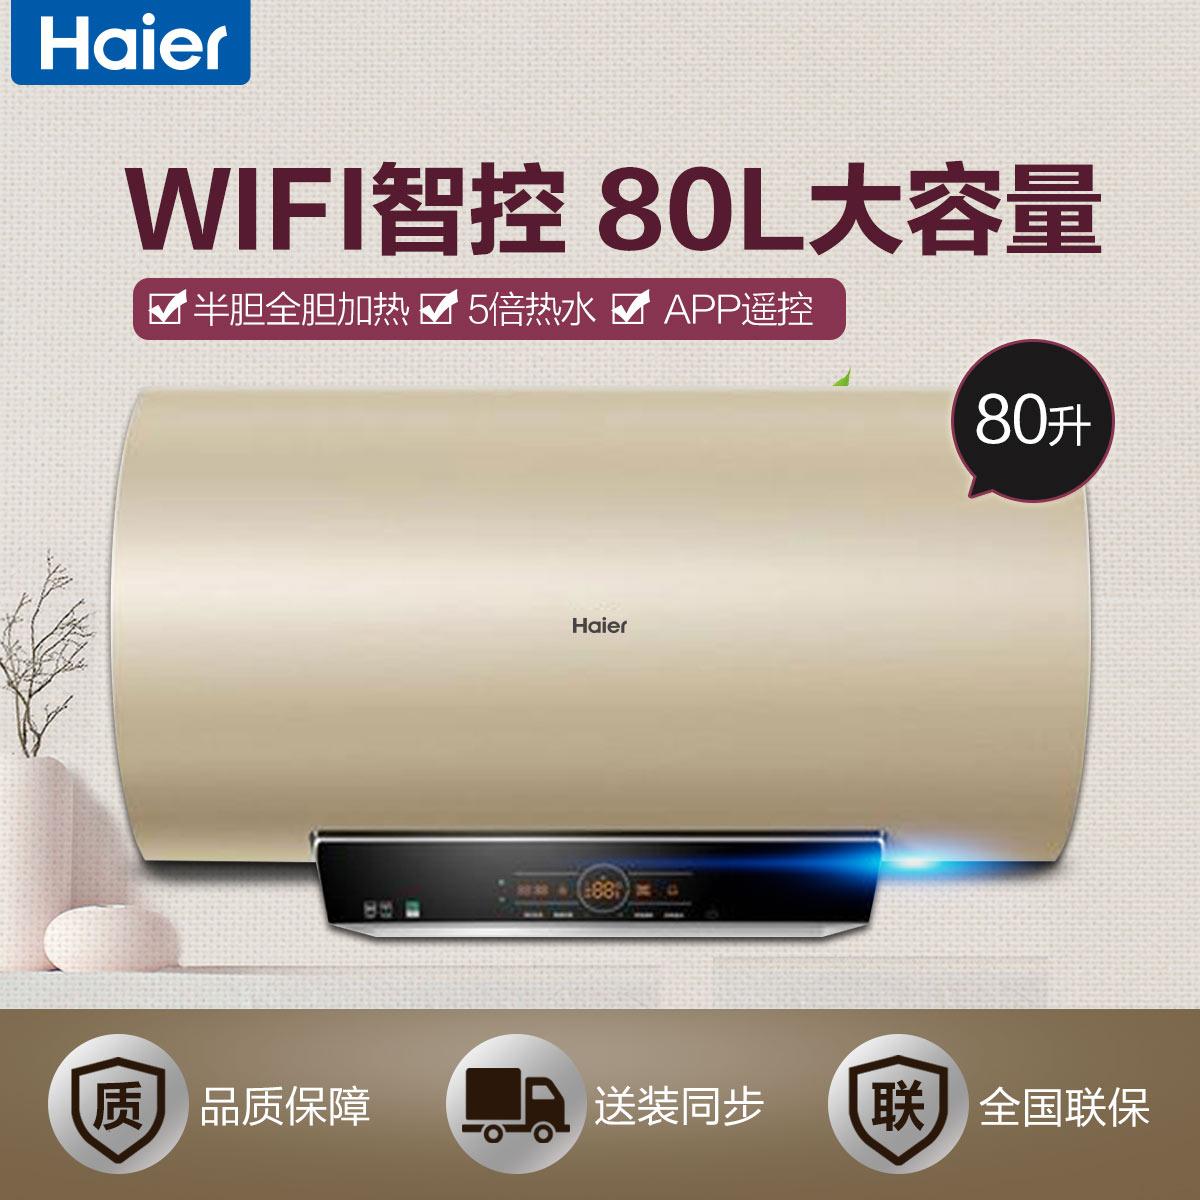 EC8003-MT3(U1) 80升速热储水式WiFi智控家用电热水器